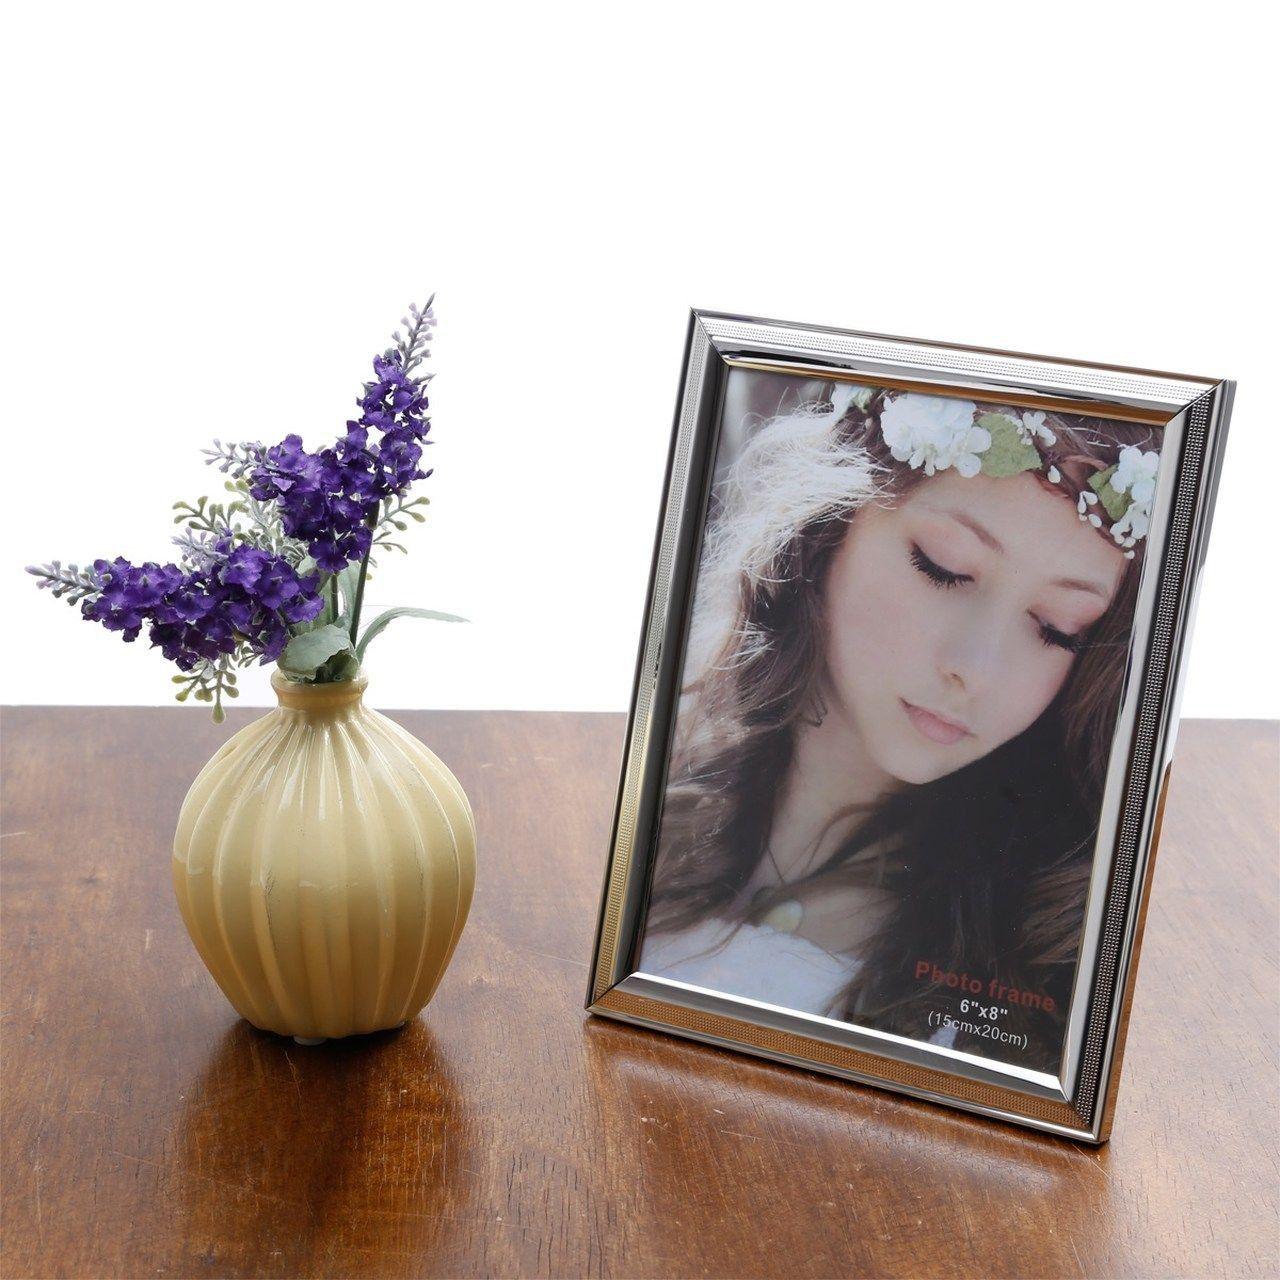 Porta-retrato 15 x 20 cm de plástico prateado Family Prestige - 25508